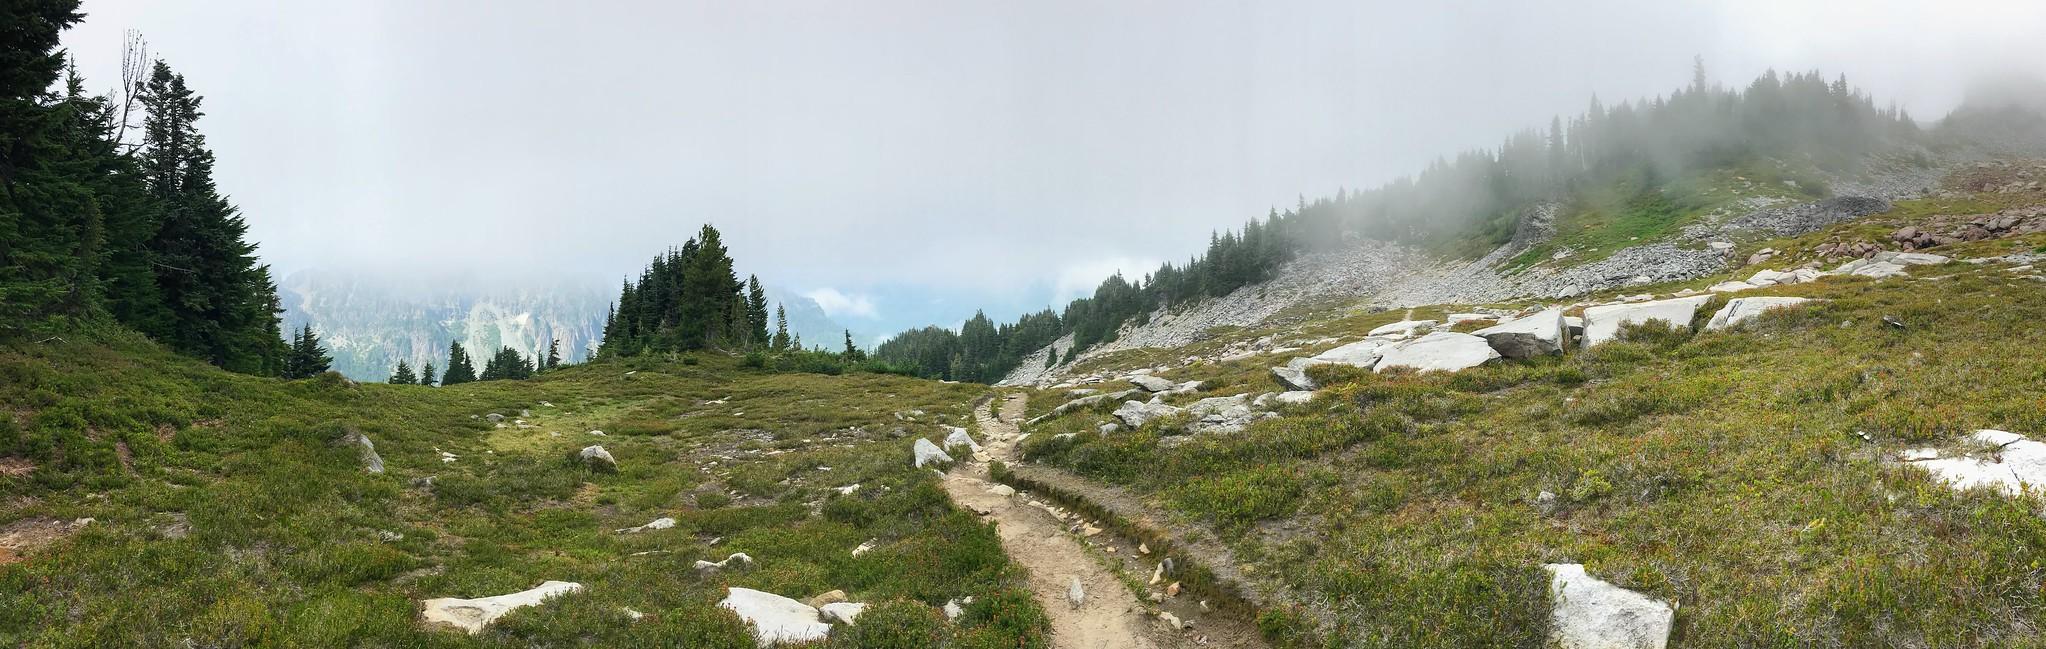 Descending to Cataract Valley